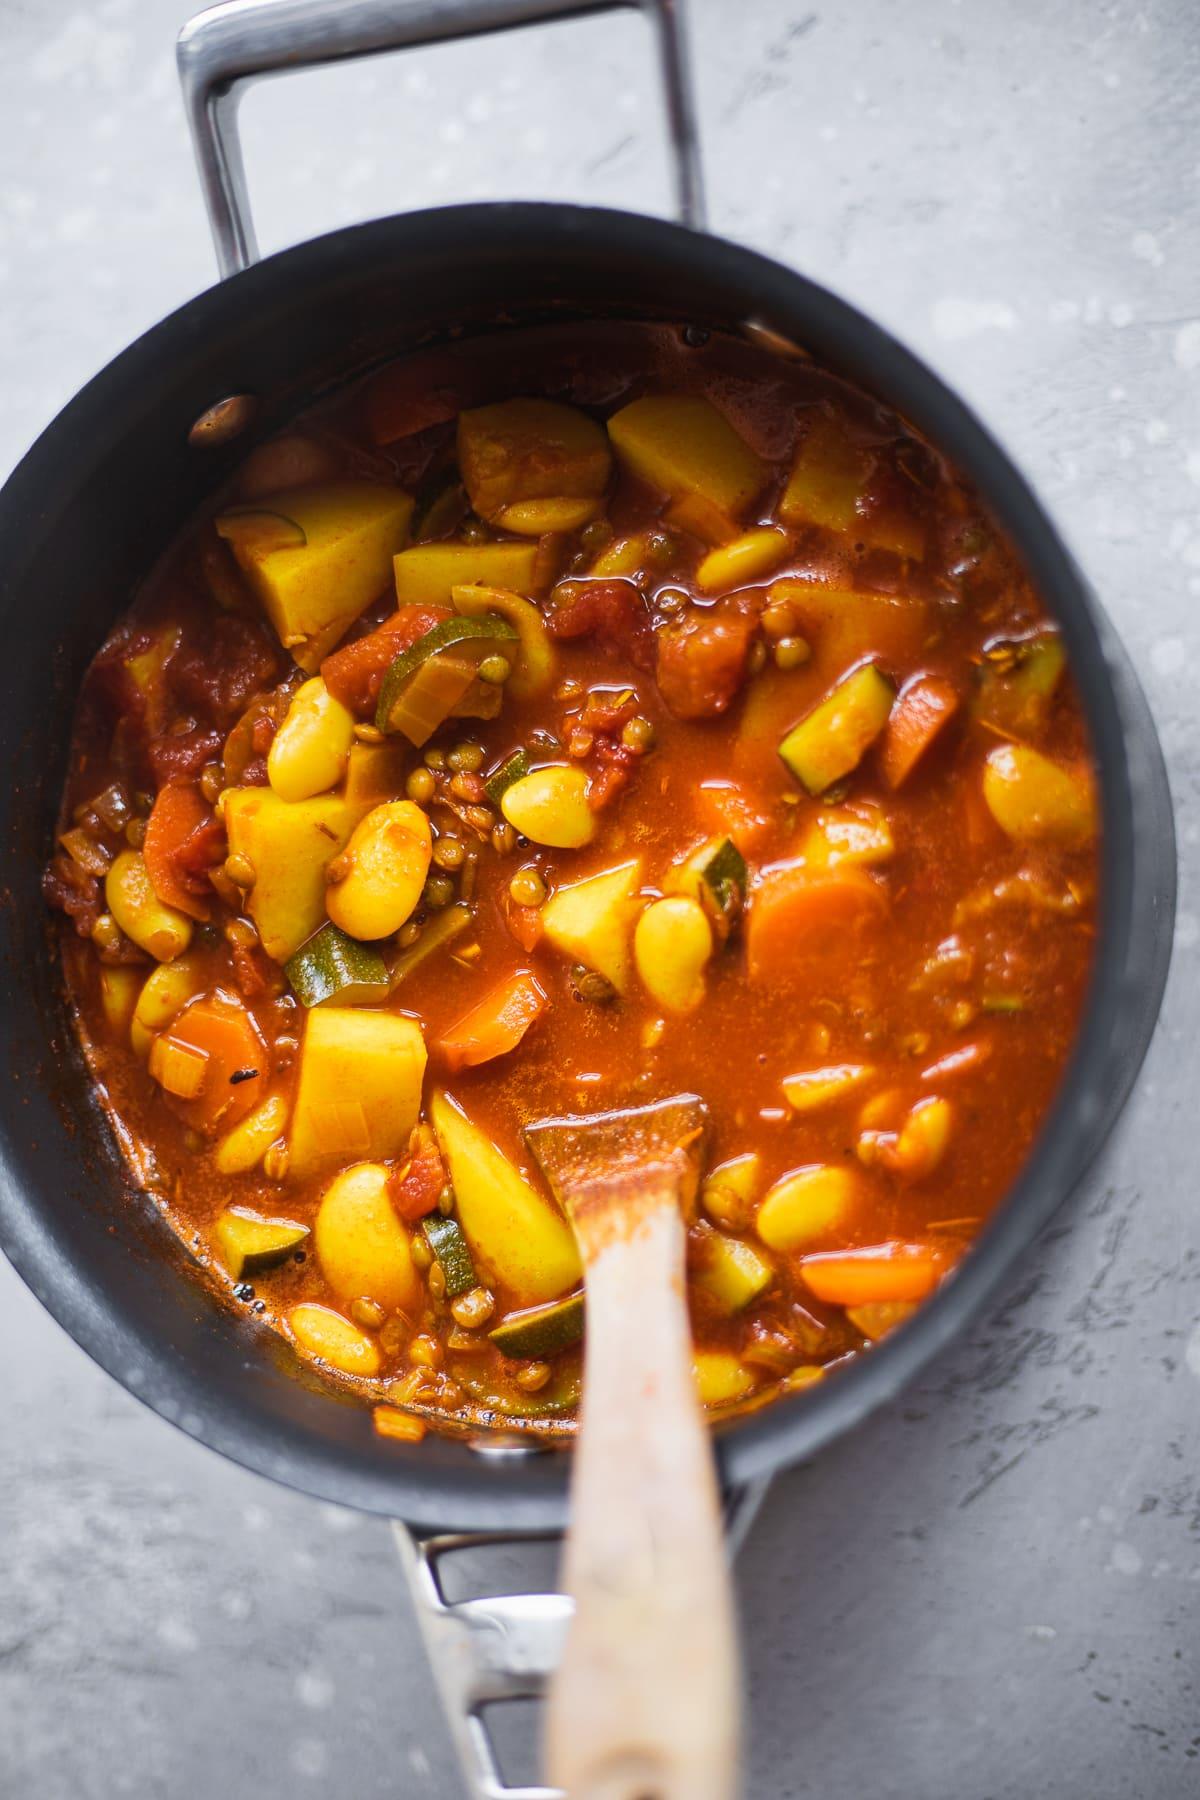 Saucepan with potato and lentil soup